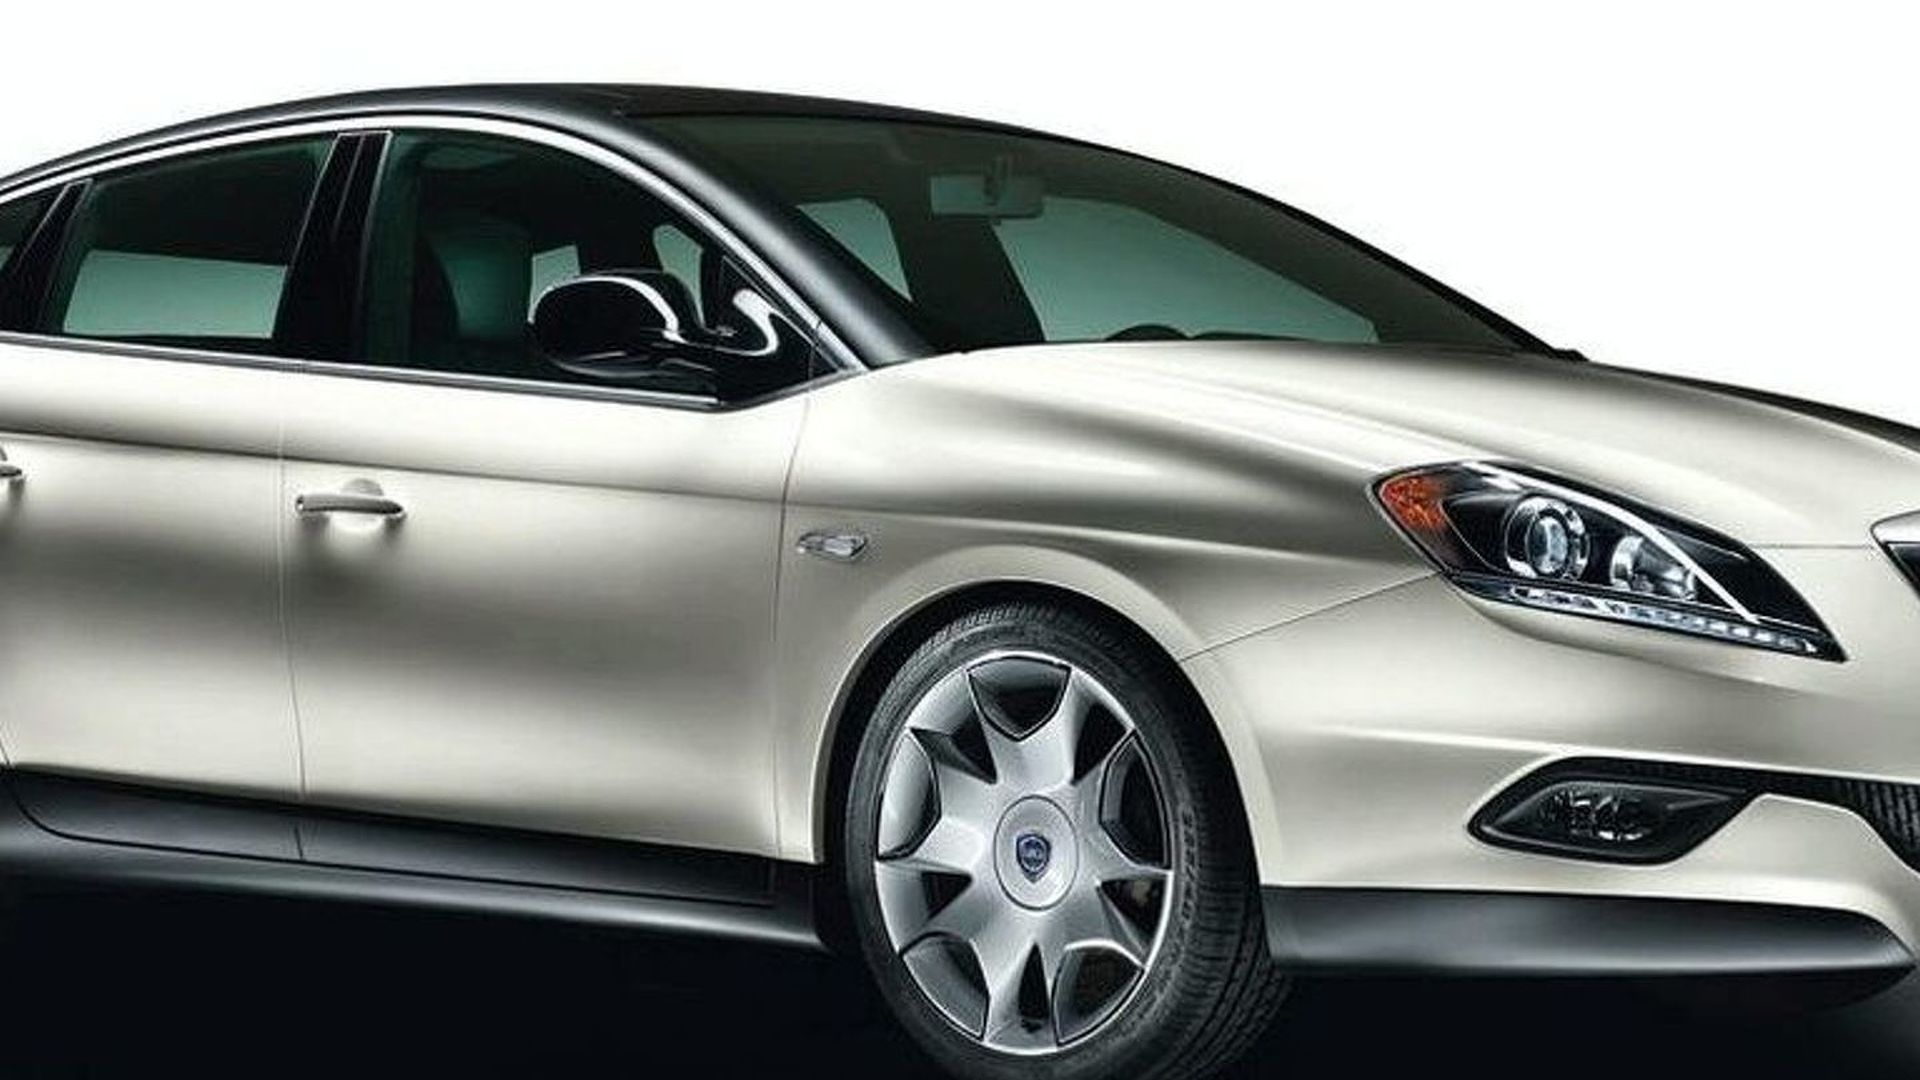 New Lancia Delta Images Online